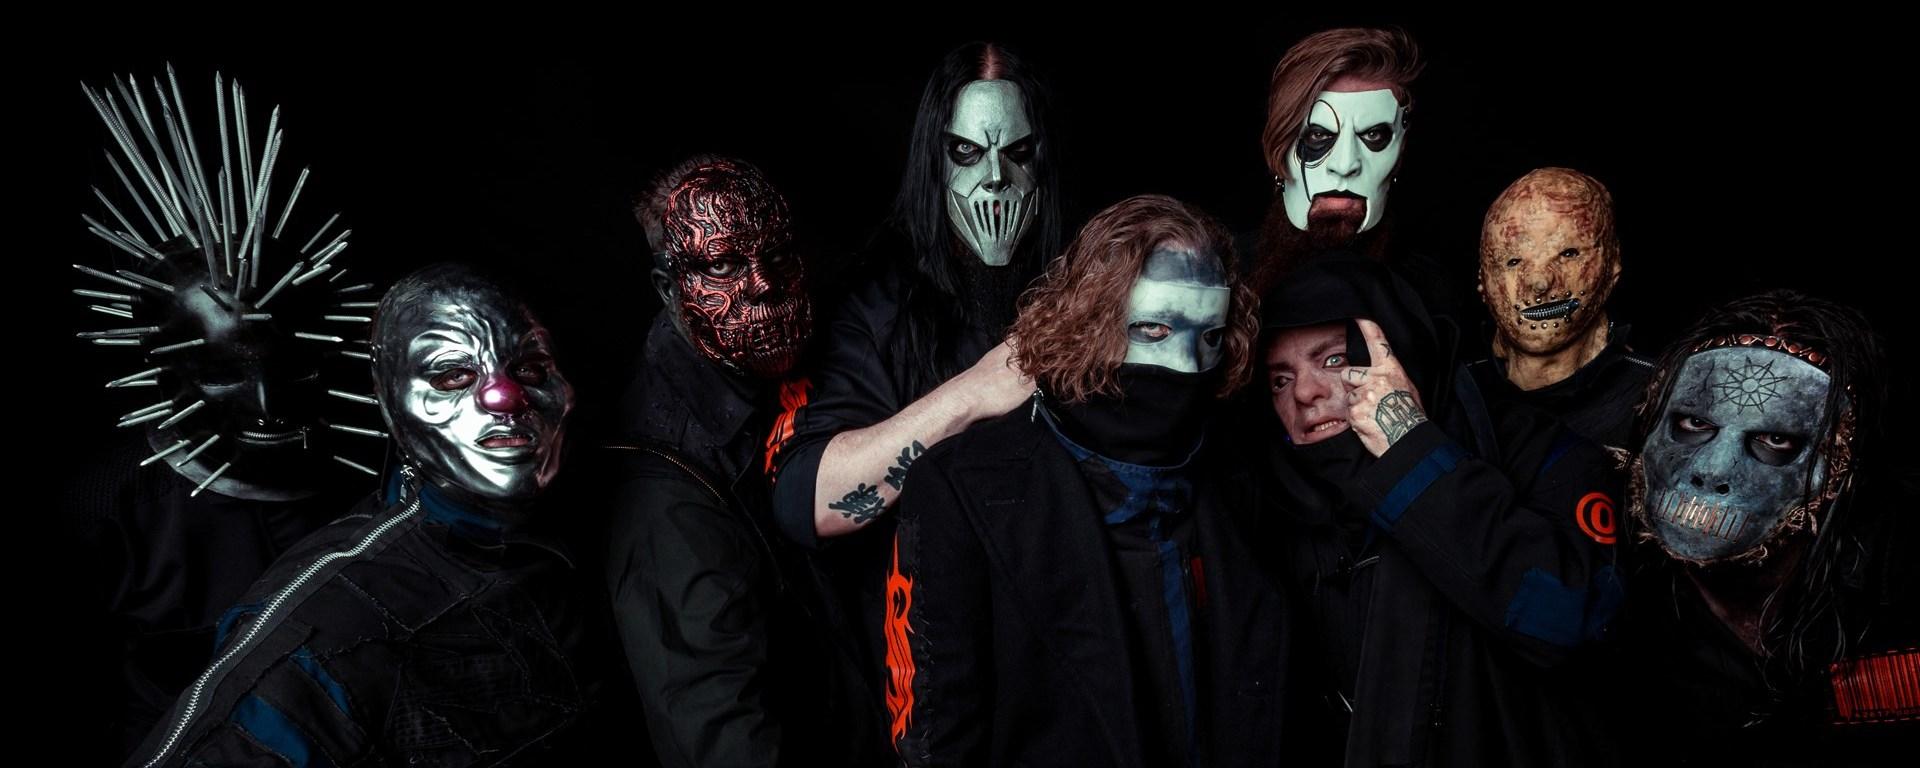 Slipknot budapest 2020 тур из Украины